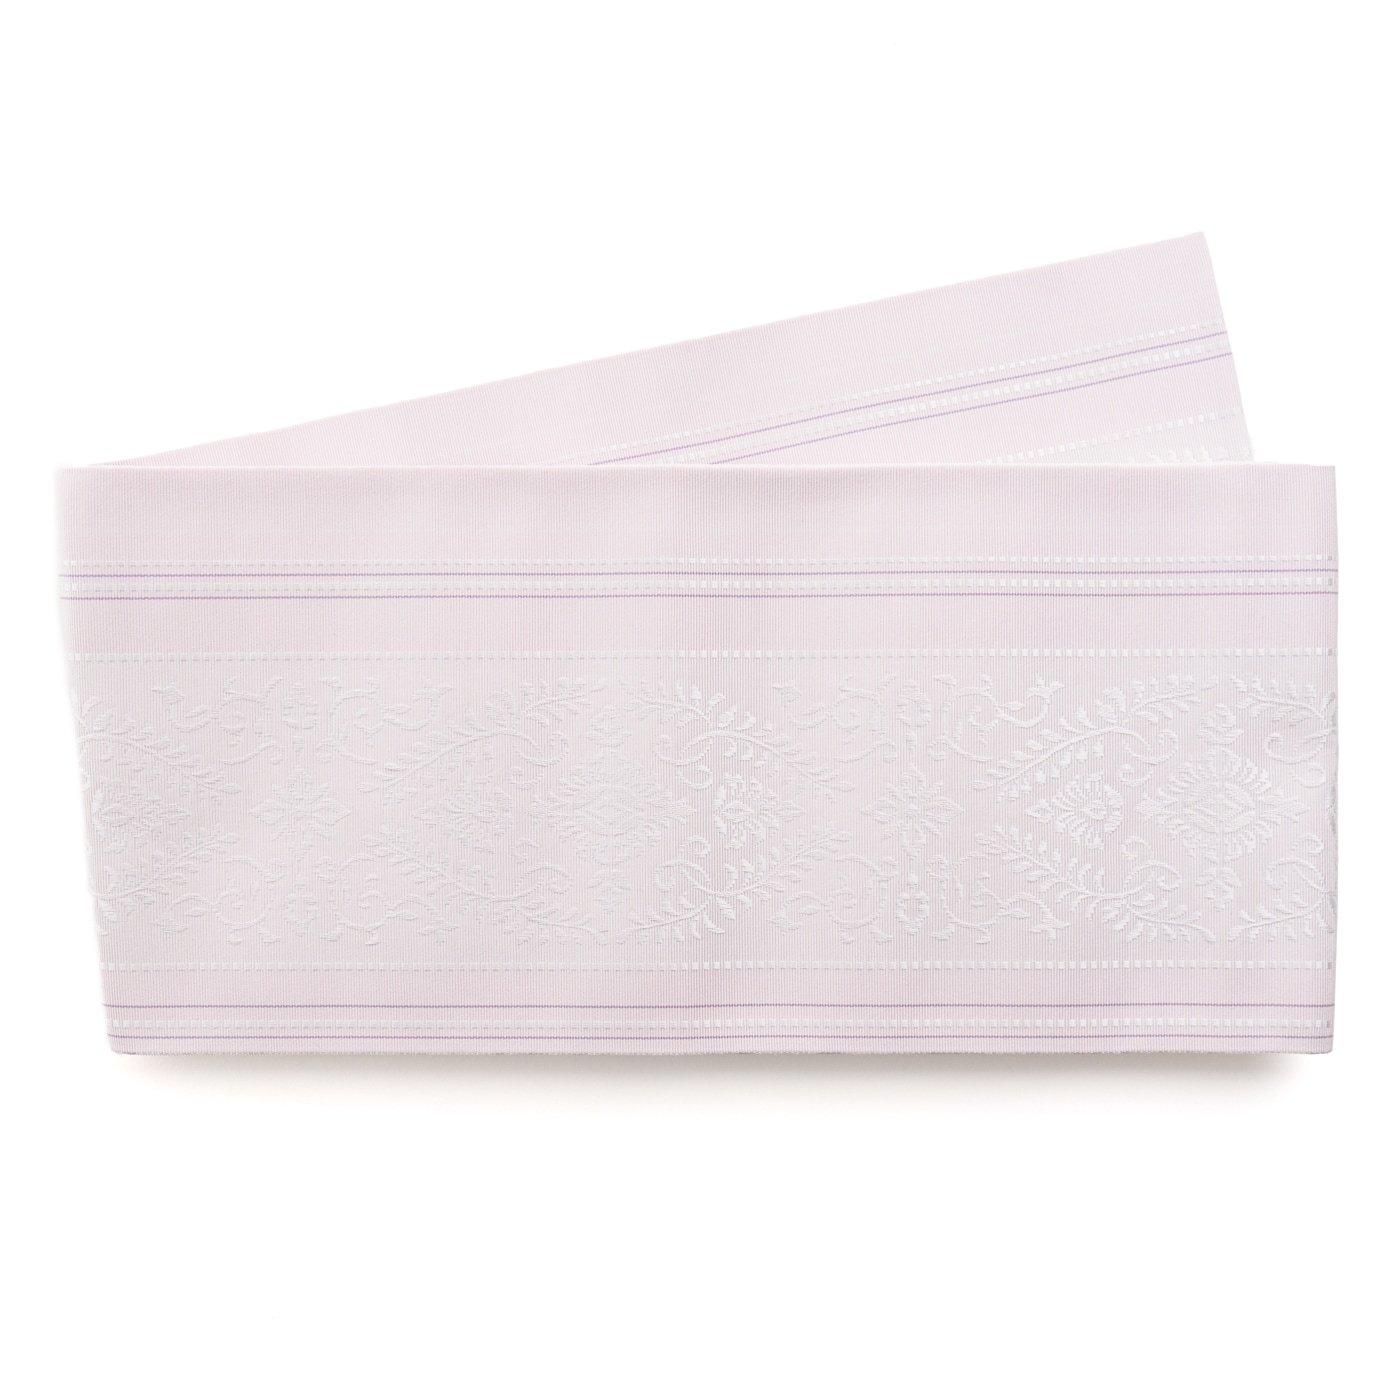 「森博多織 花紋 薄紅藤」の商品画像